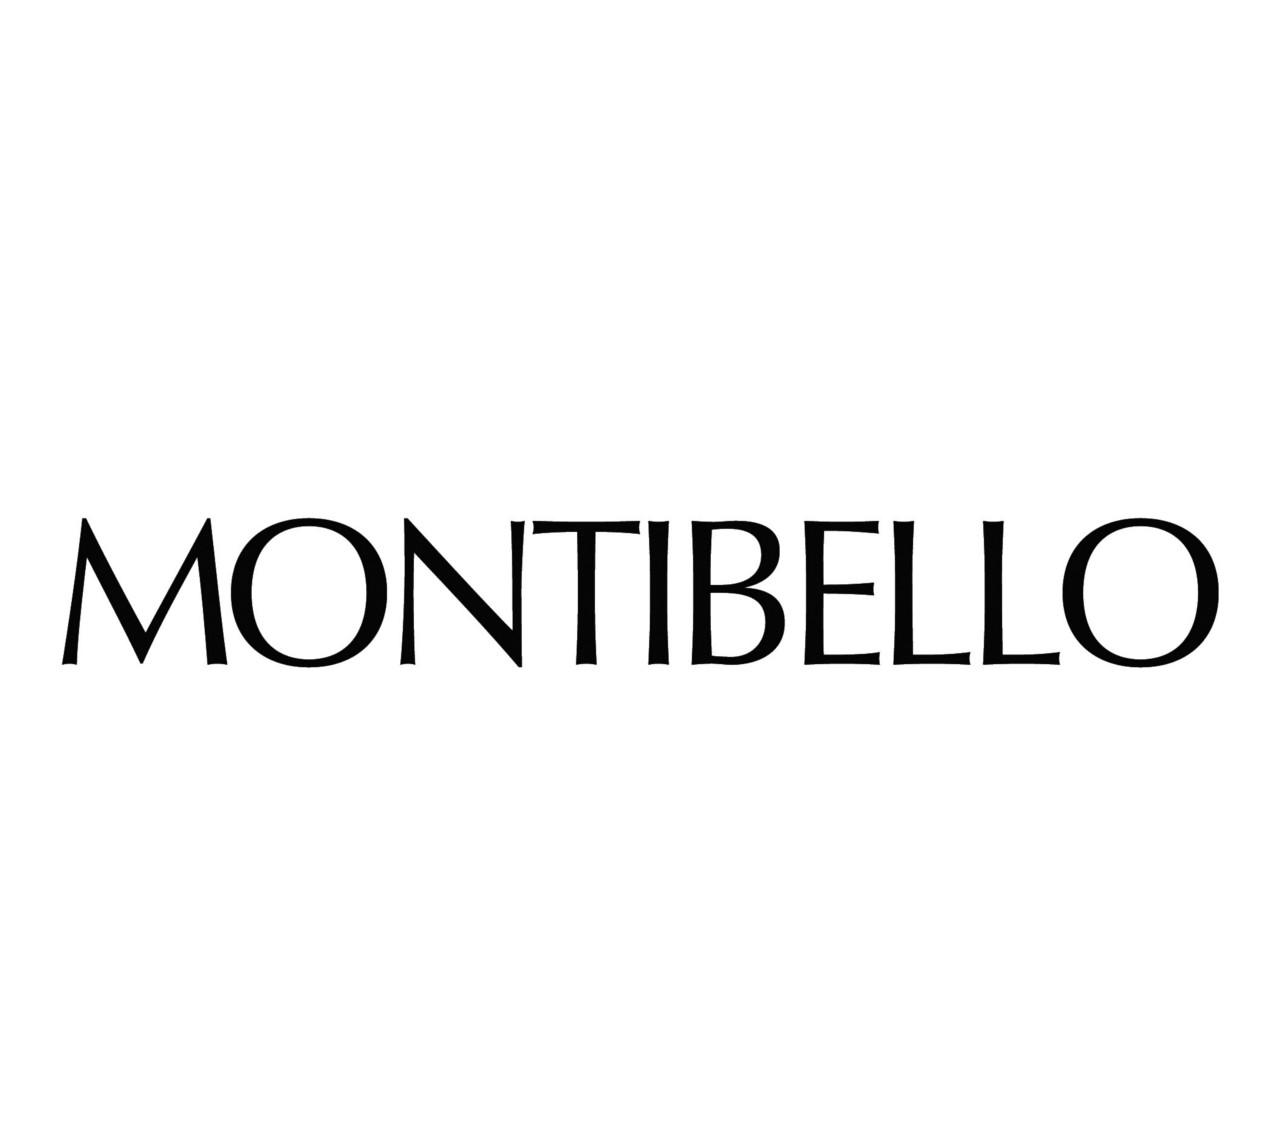 Podsumowanie akcji z Montibello oraz Face&Look